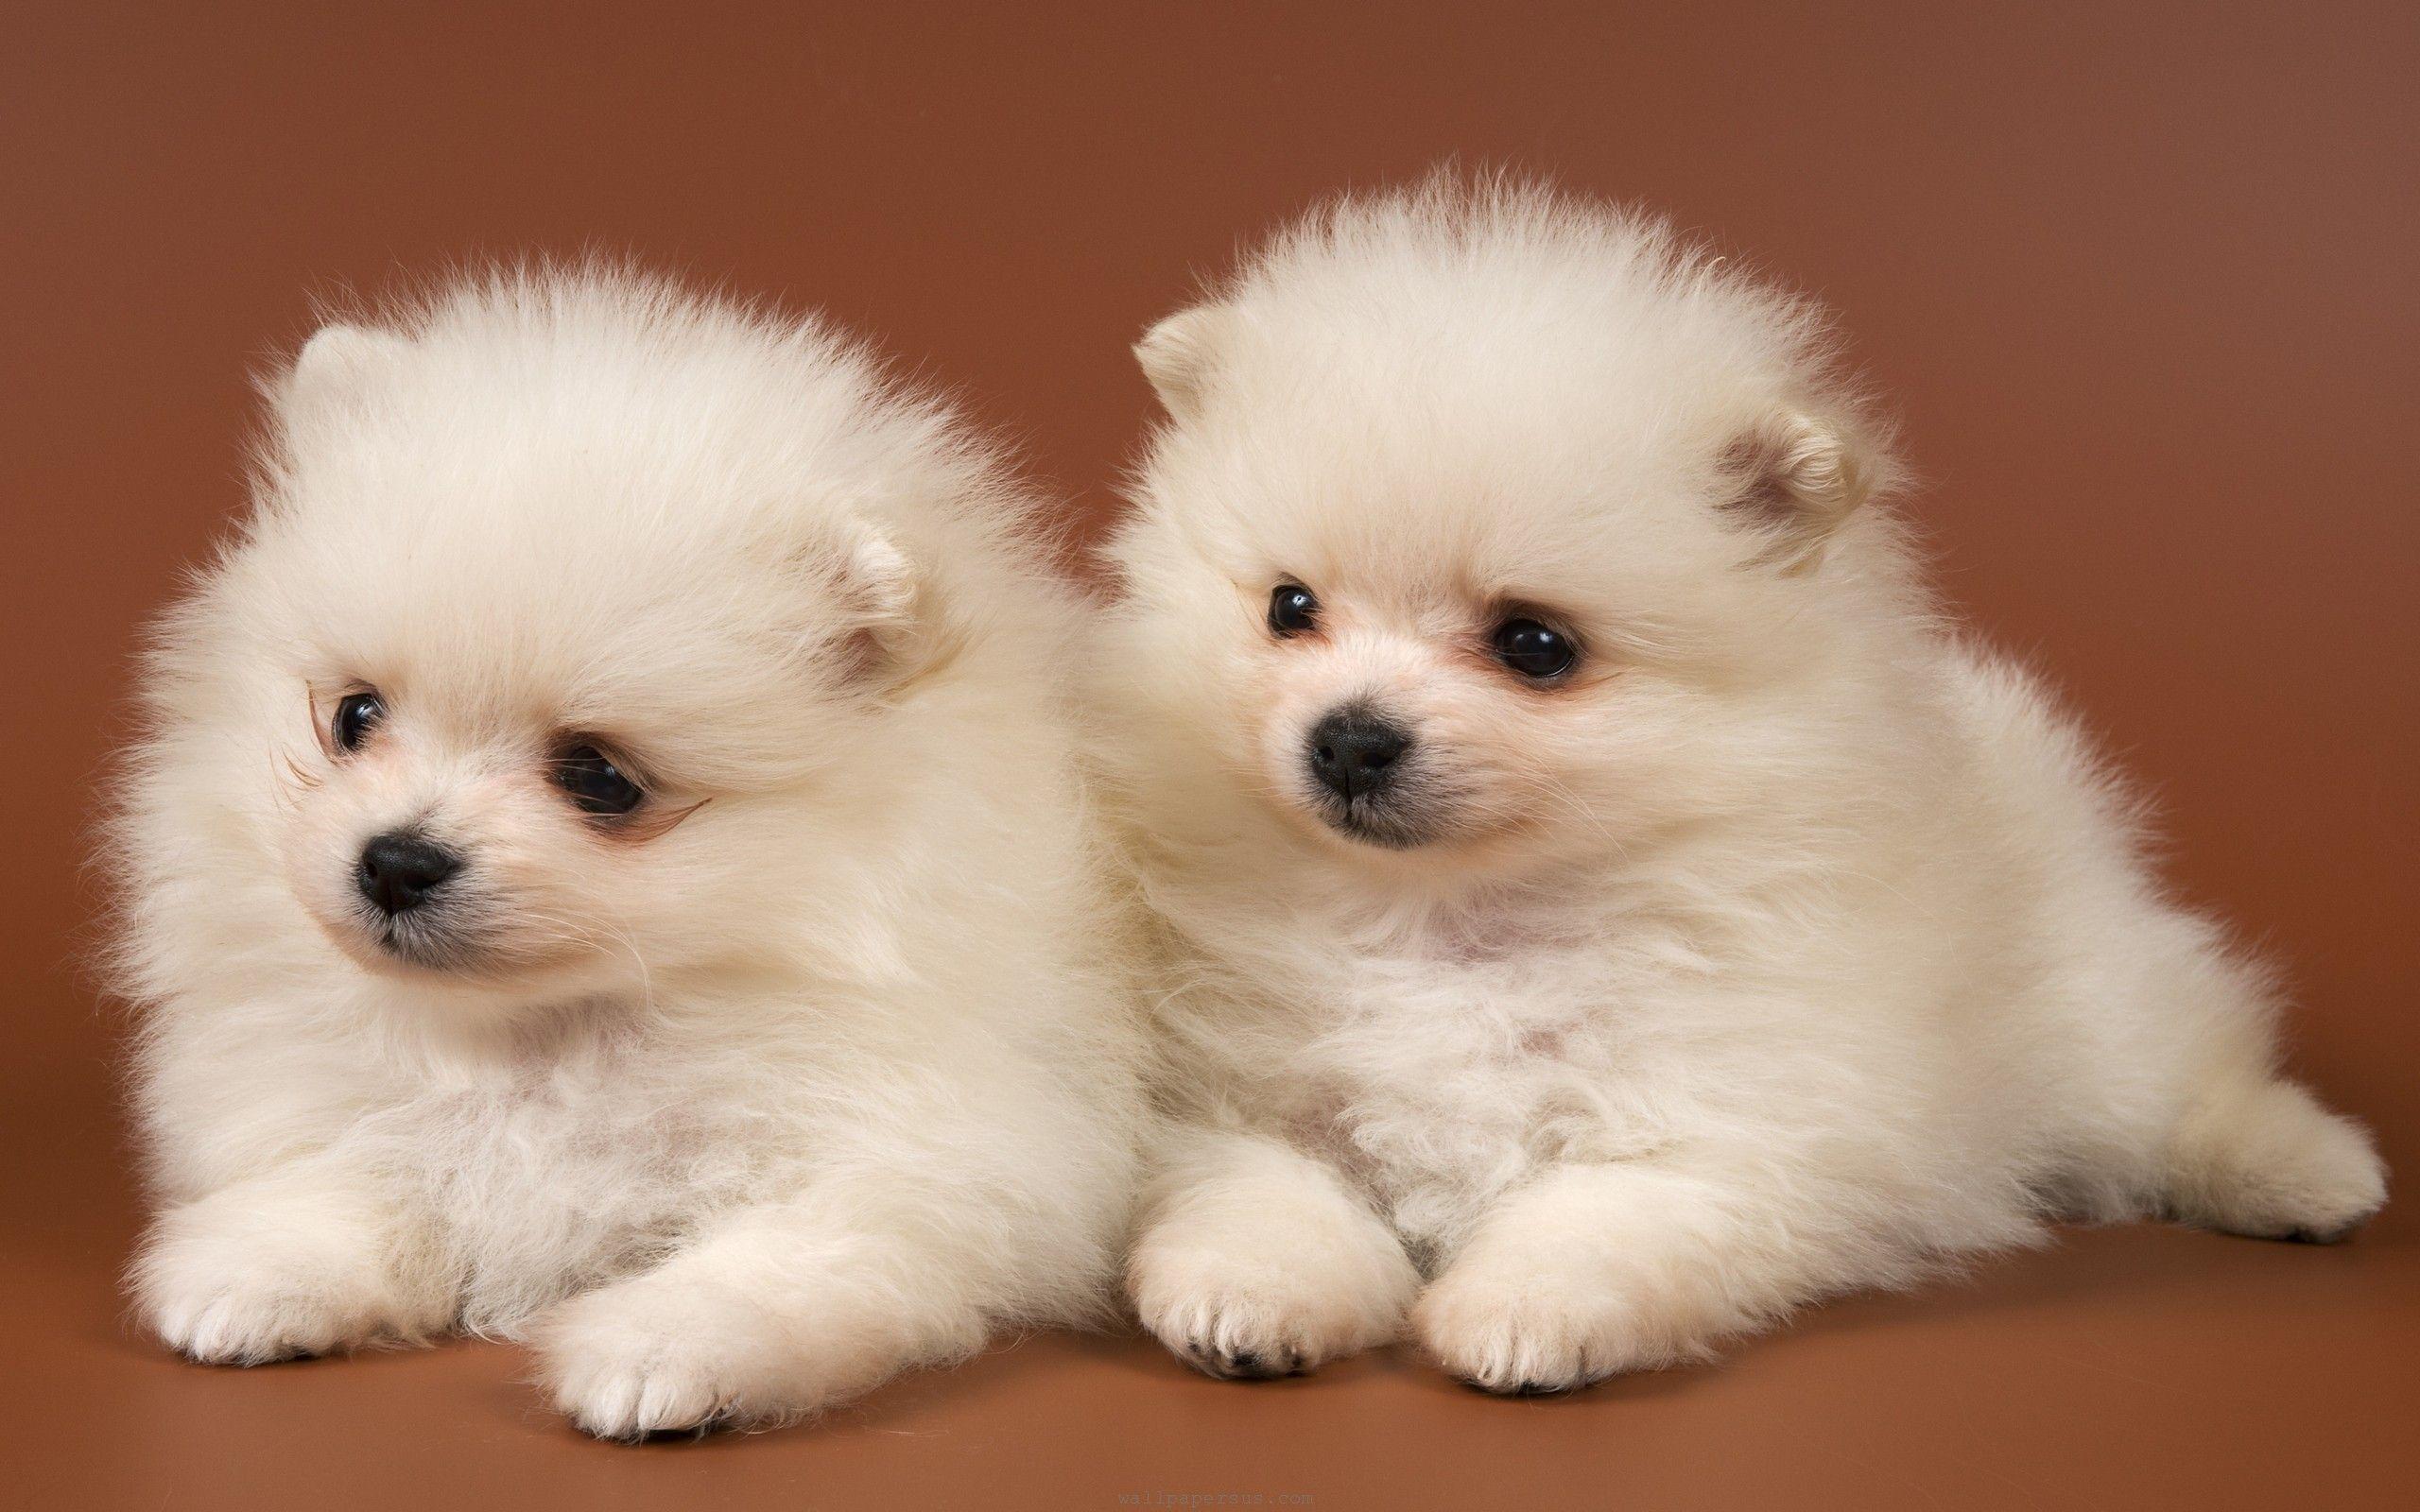 Puppy Wallpaper Cute Baby Puppies Super Cute Puppies Cute Puppy Wallpaper